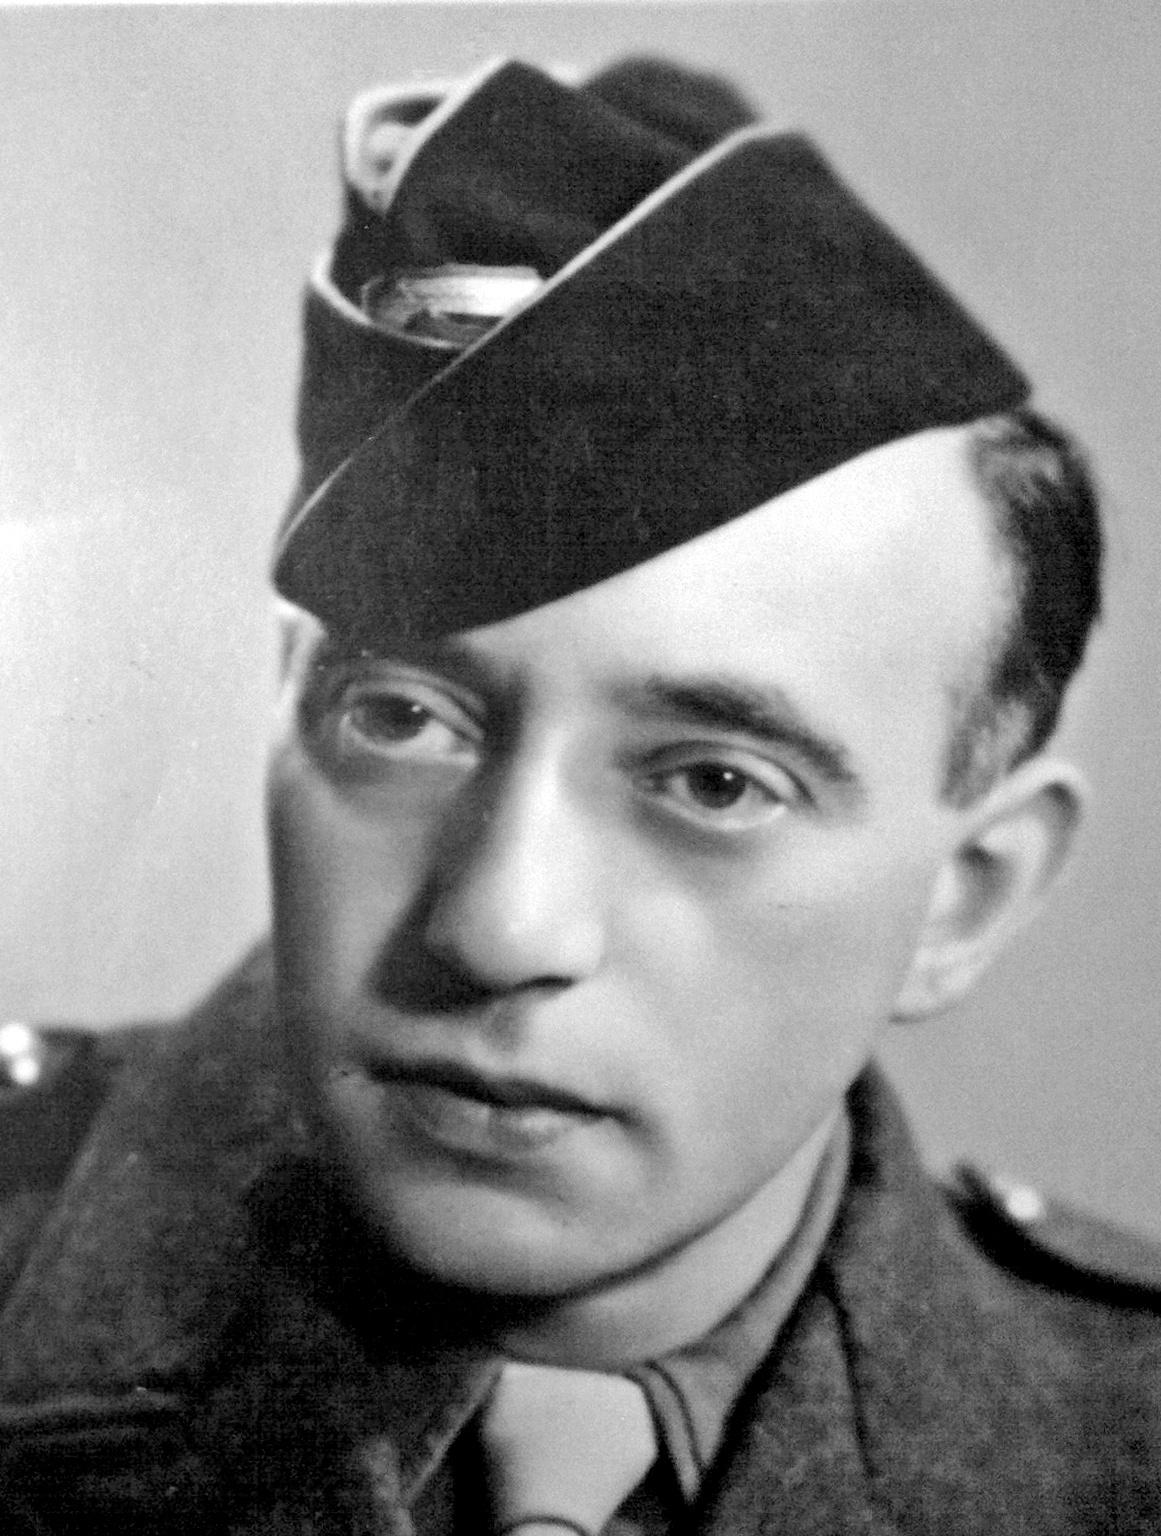 René Thuillier en 1947